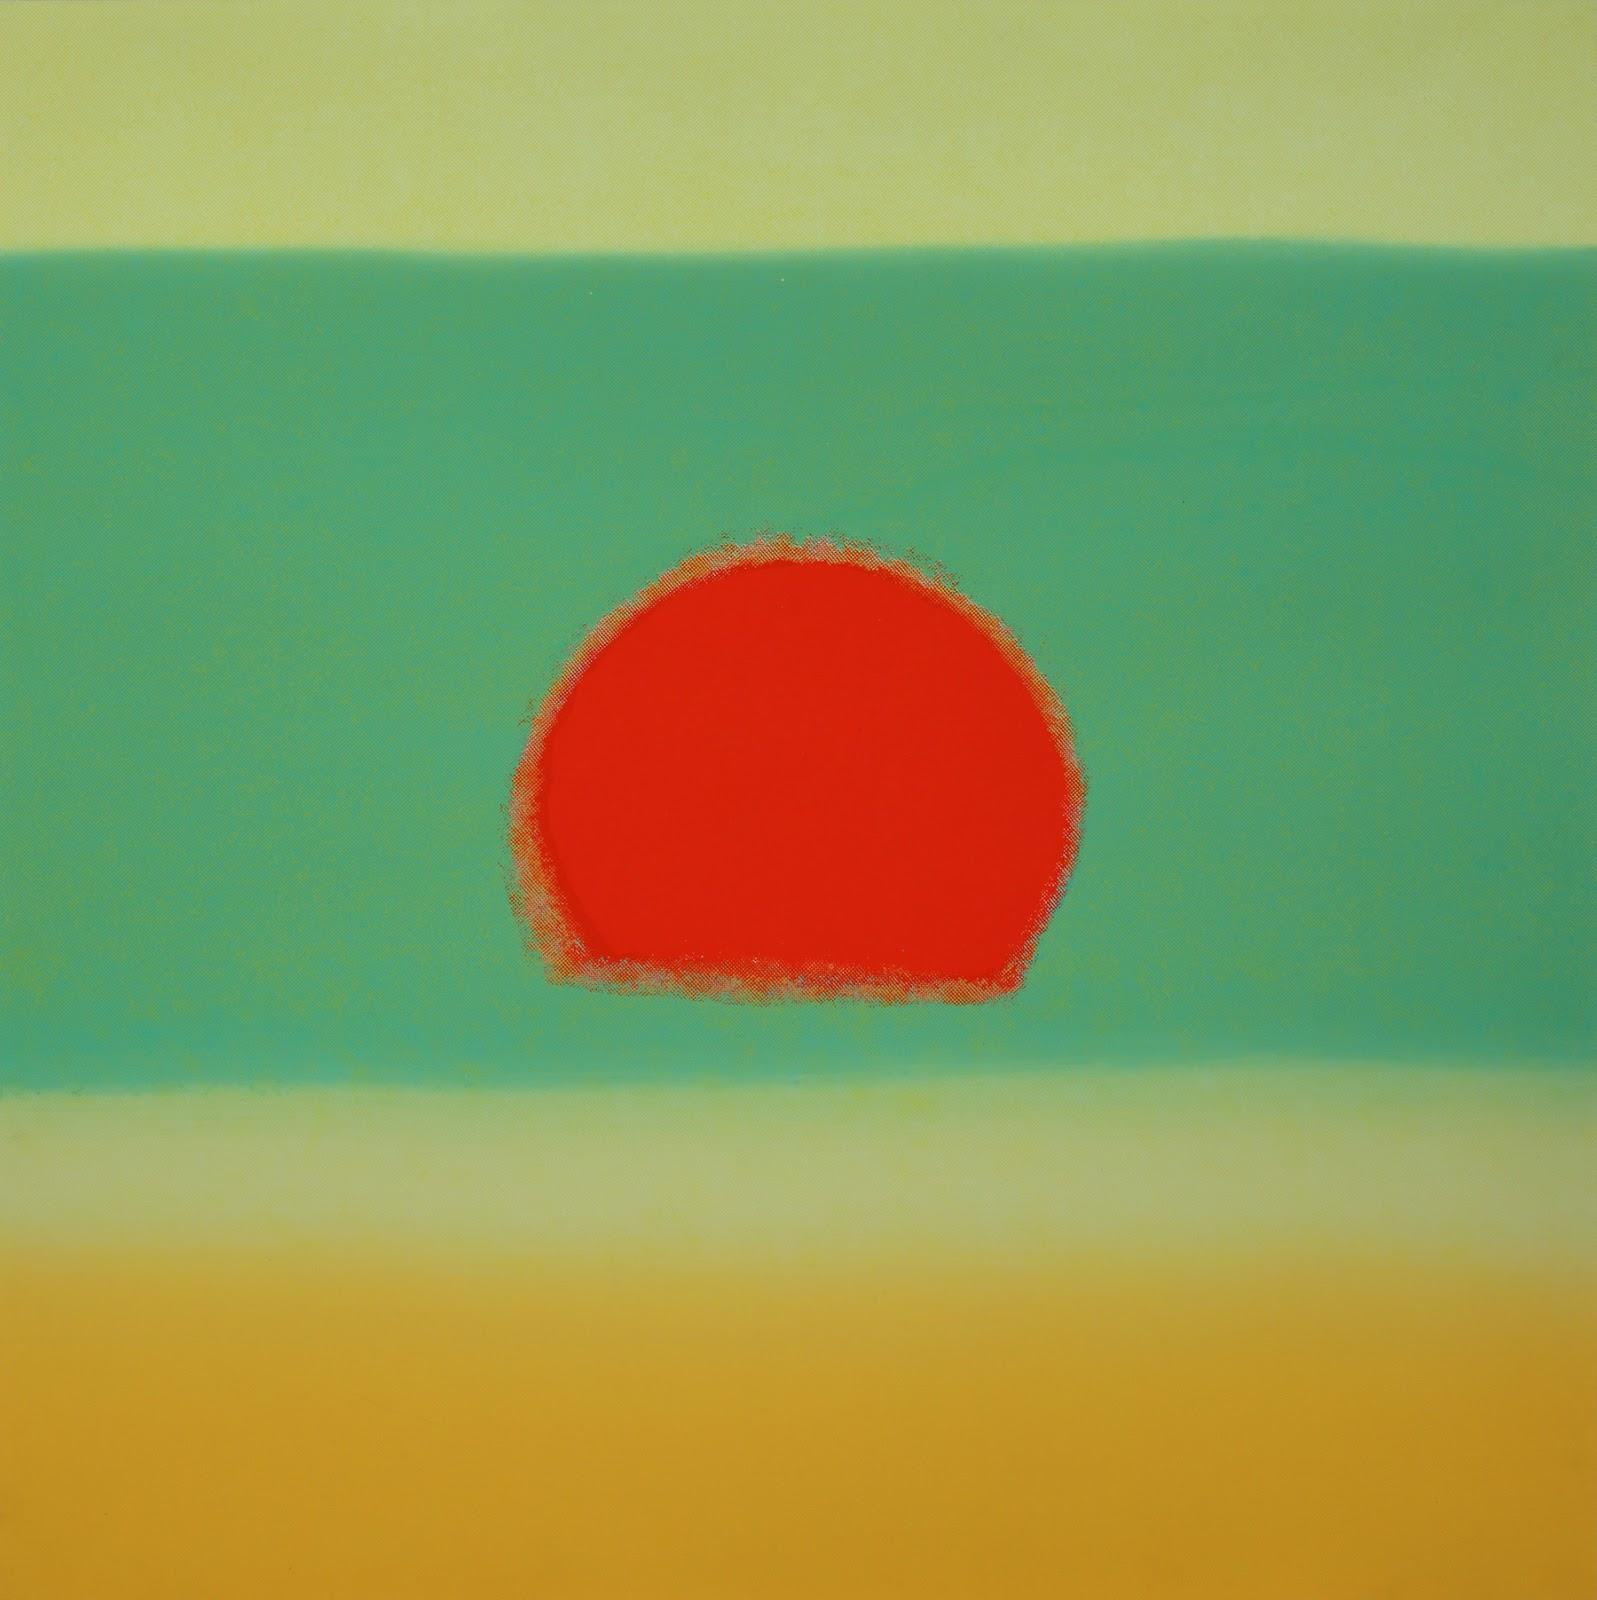 http://2.bp.blogspot.com/-RbxCOiG8qU0/UBT6KiybLfI/AAAAAAAAAR8/UoLiWmDVtyI/s1600/11_Andy_Warhol_Sunset_1972_300dpi.jpg